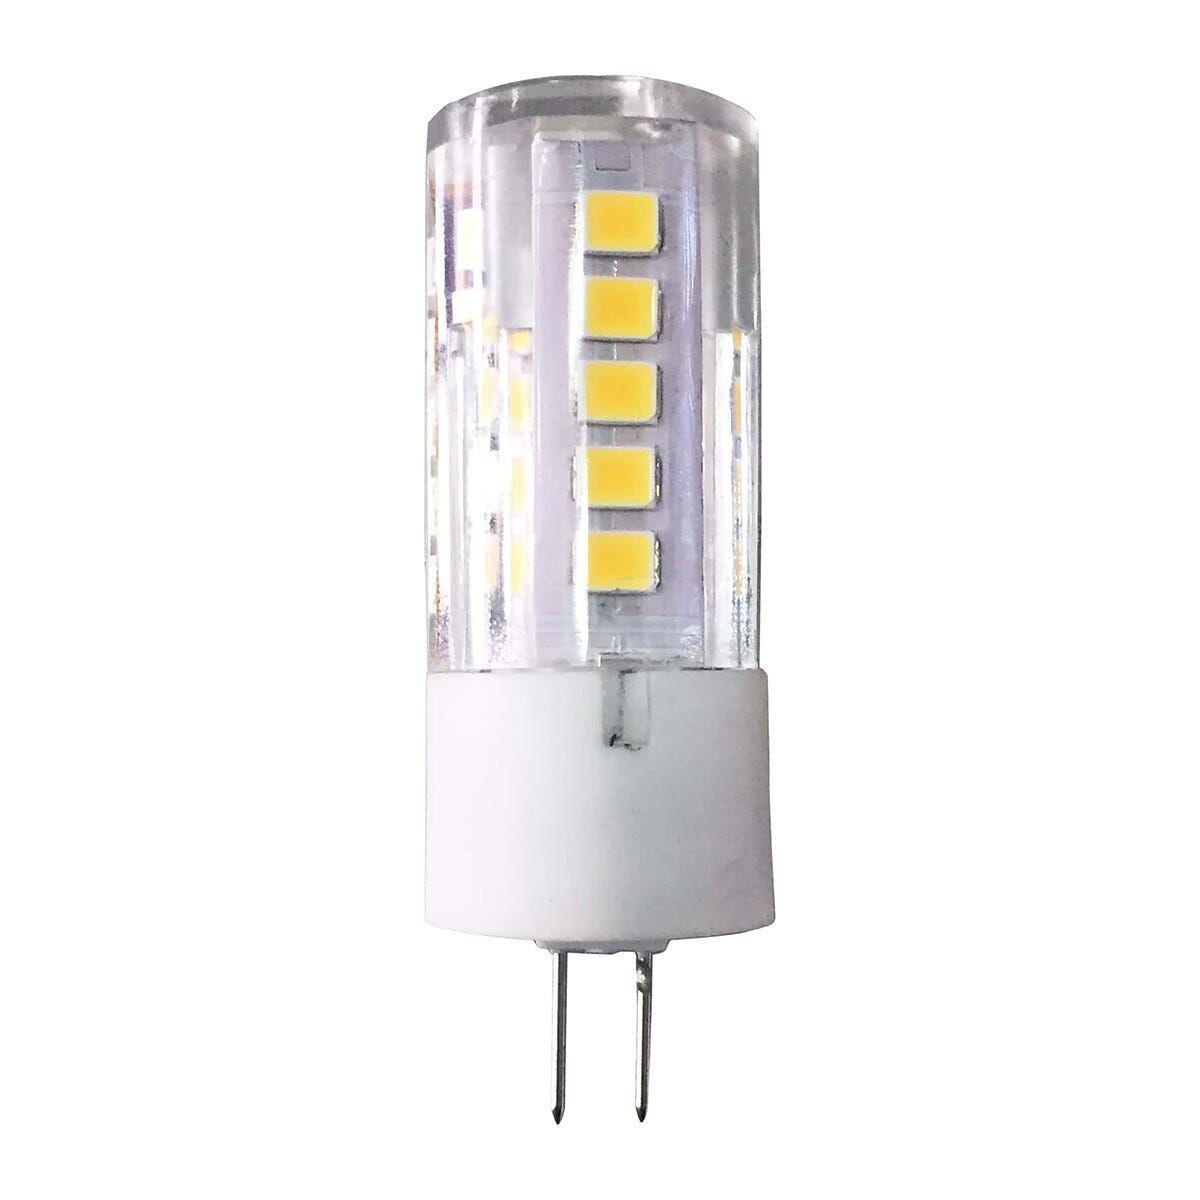 parko 2 lampadine  led mr11 g4 3w=25w 250 lumen 2700k luce calda Ø 16x46 mm